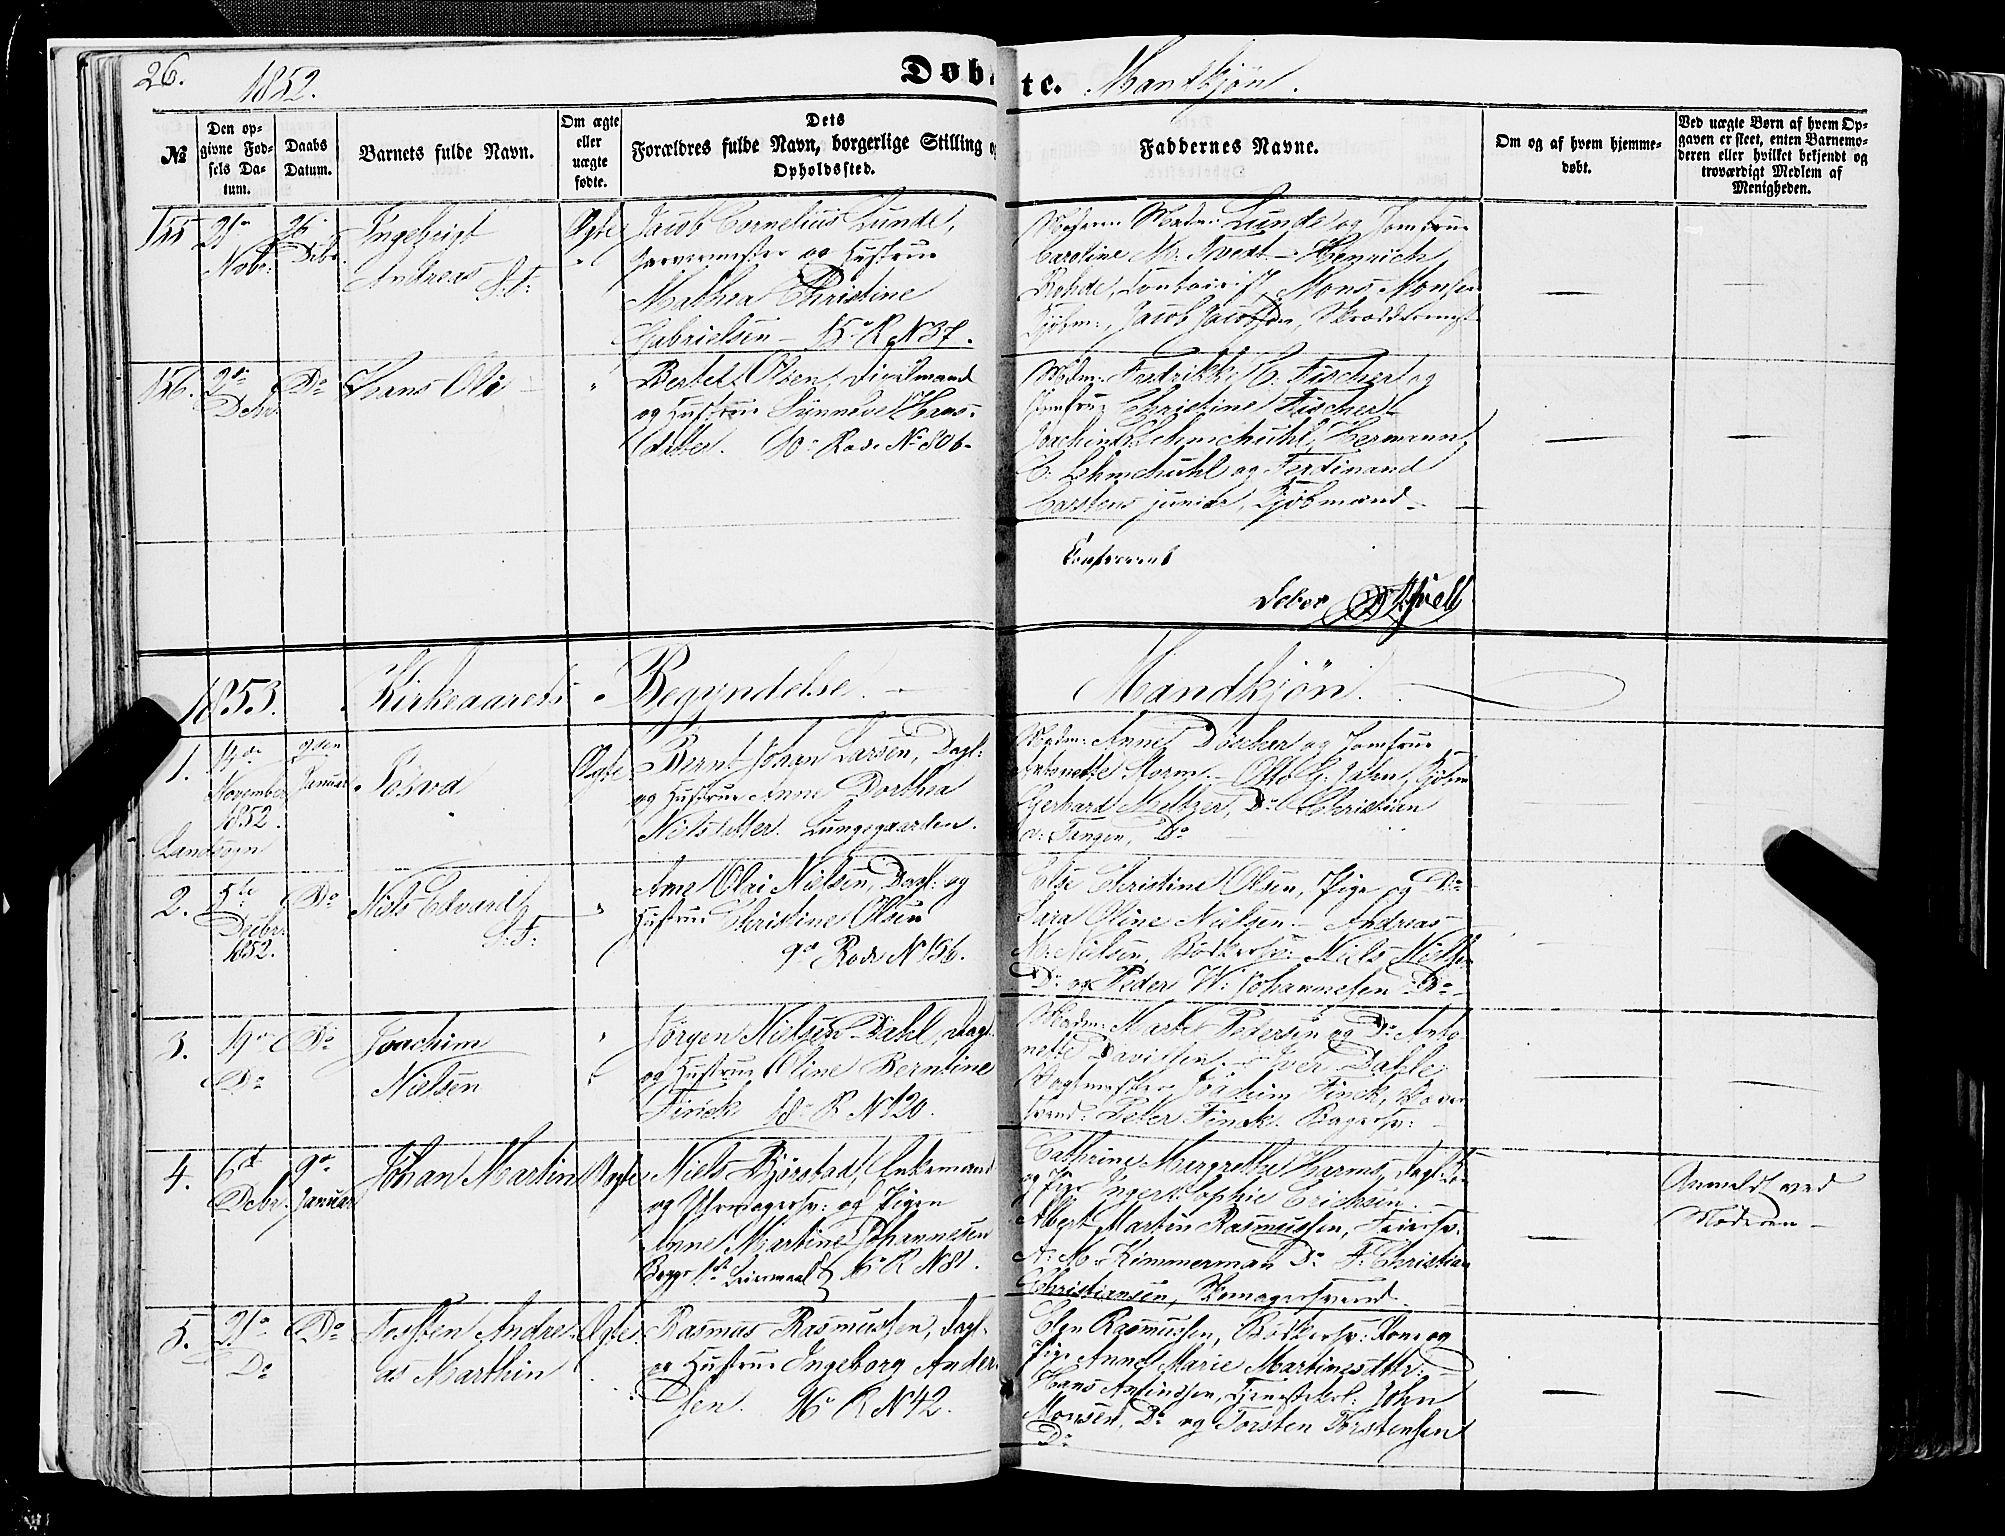 SAB, Domkirken Sokneprestembete, H/Haa/L0020: Ministerialbok nr. B 3, 1851-1859, s. 26